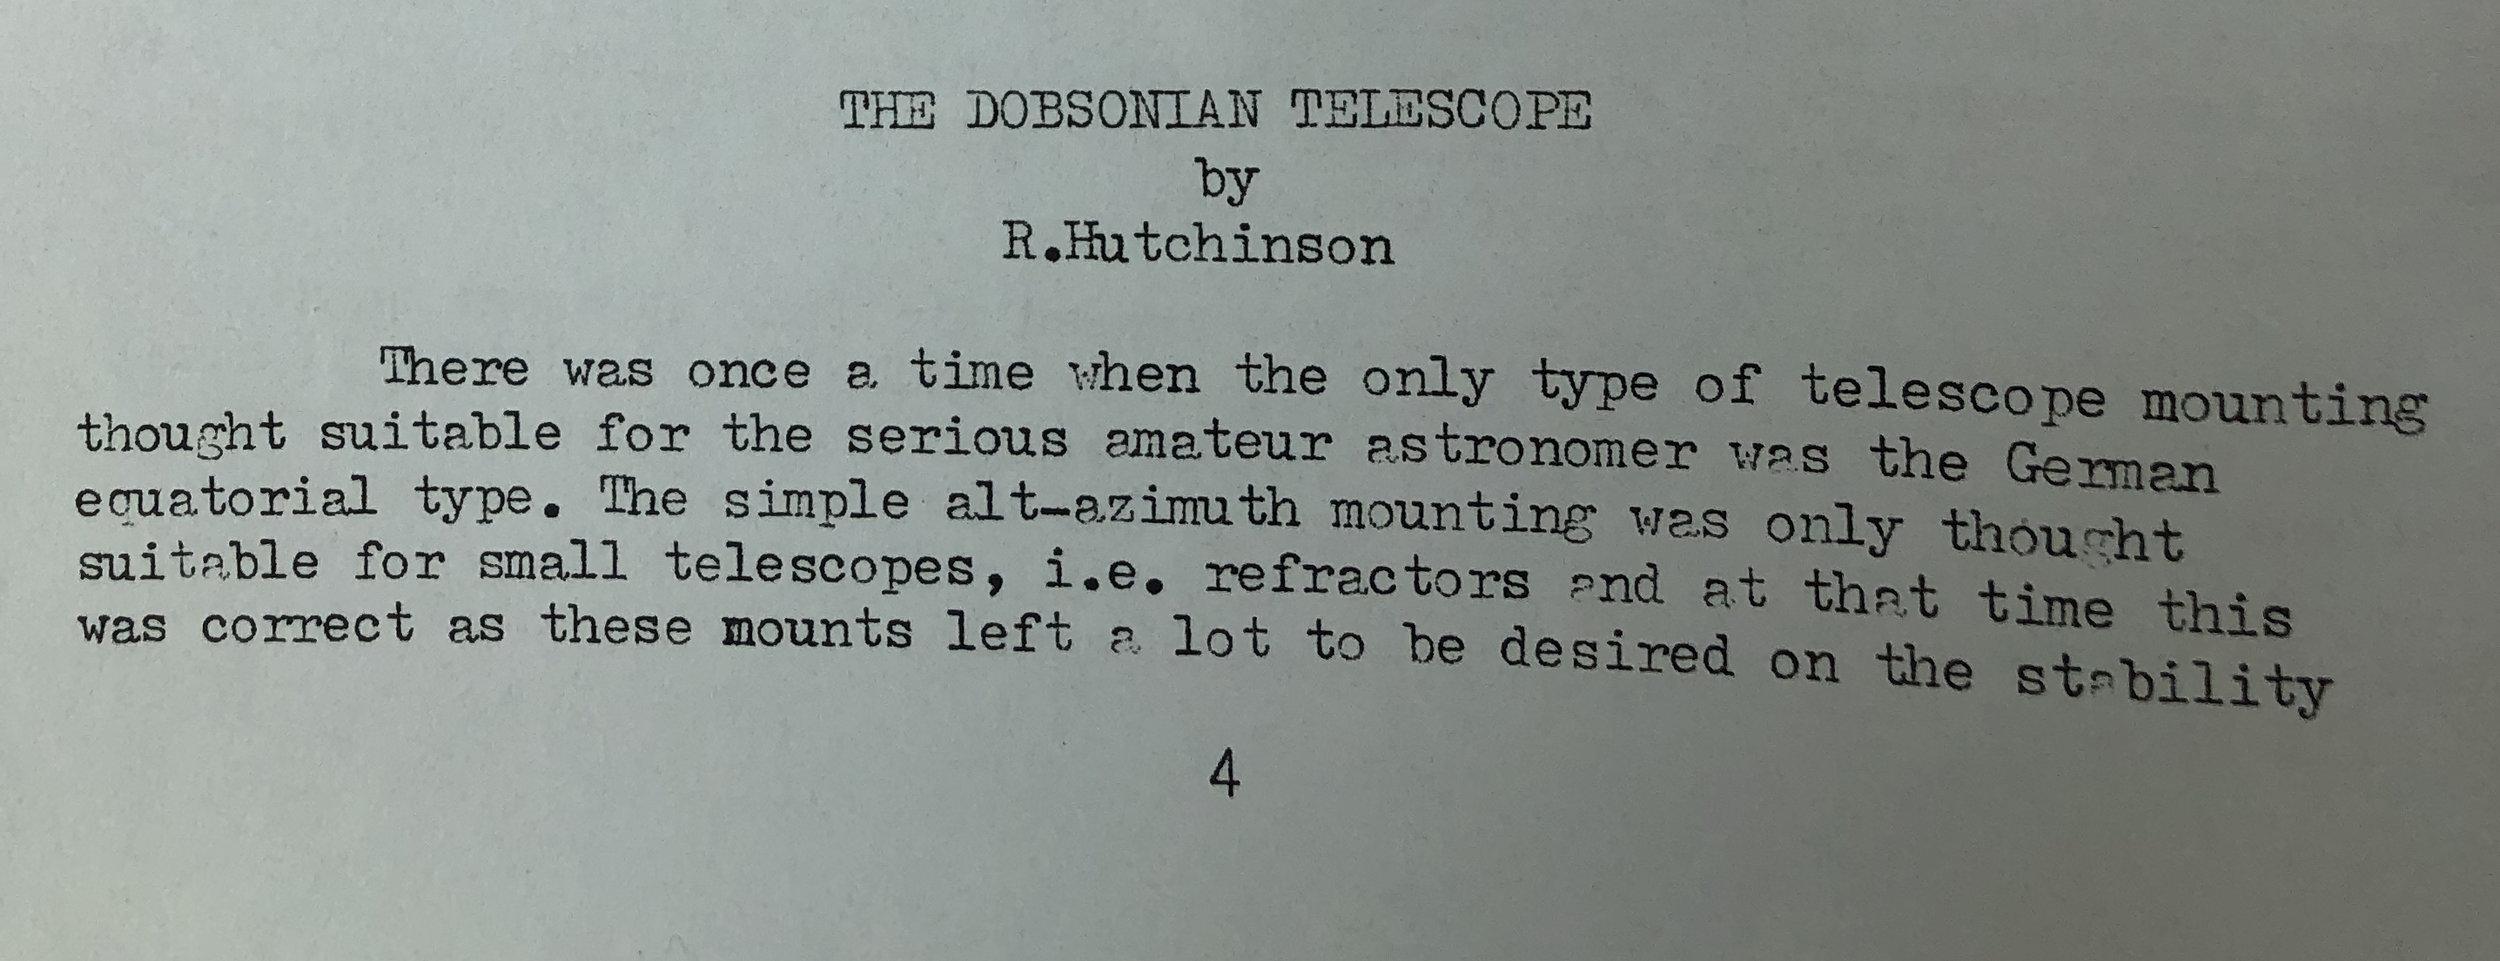 Dobsonian 1.jpg